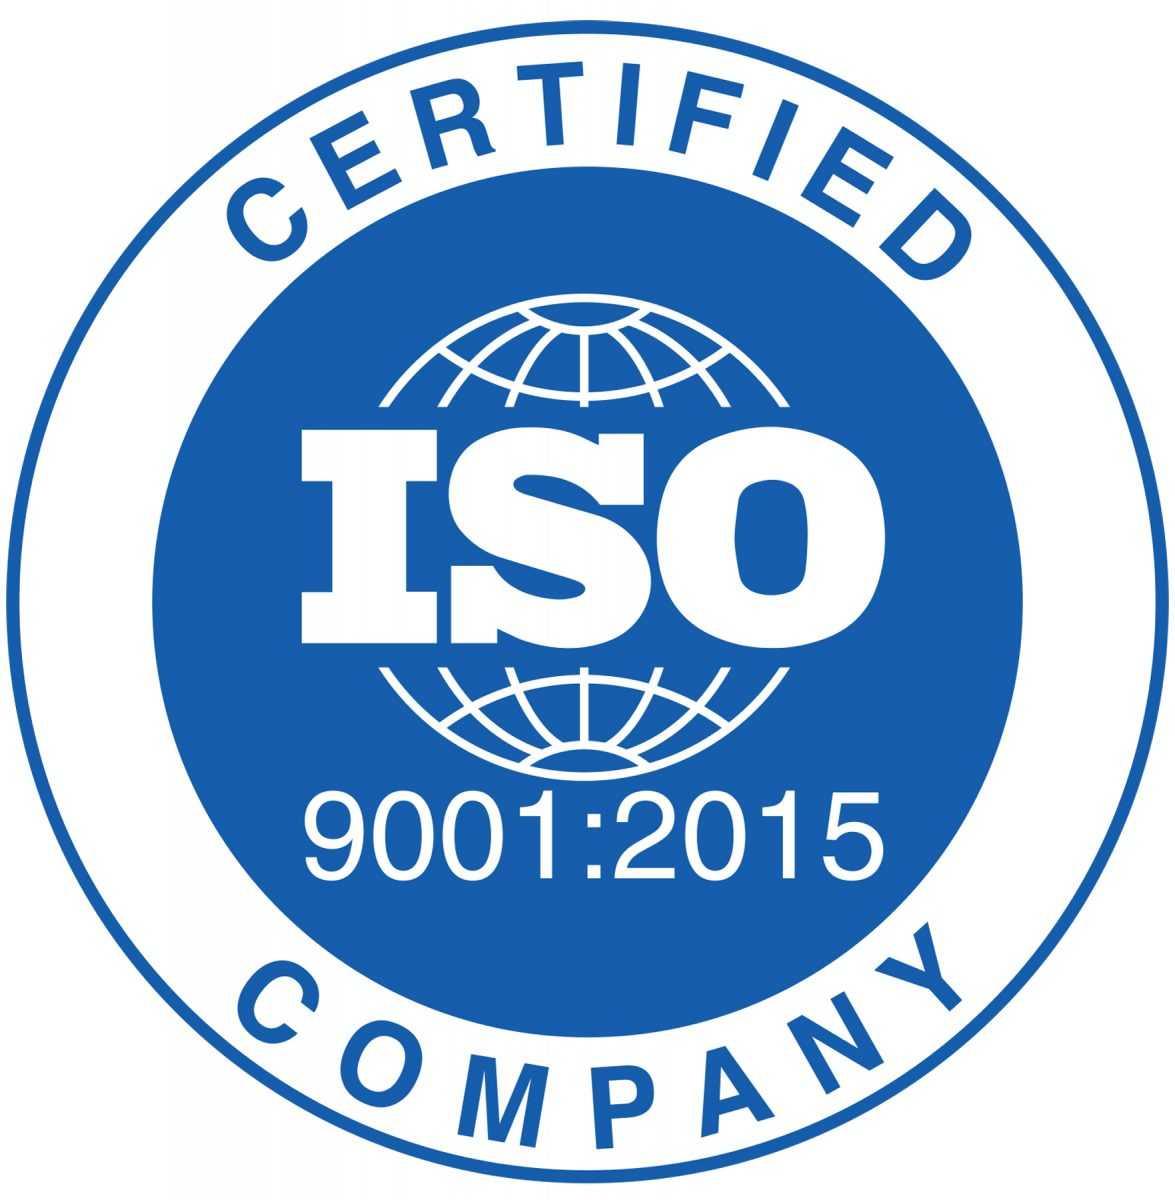 Система менеджмента качества ISO 9001-2015